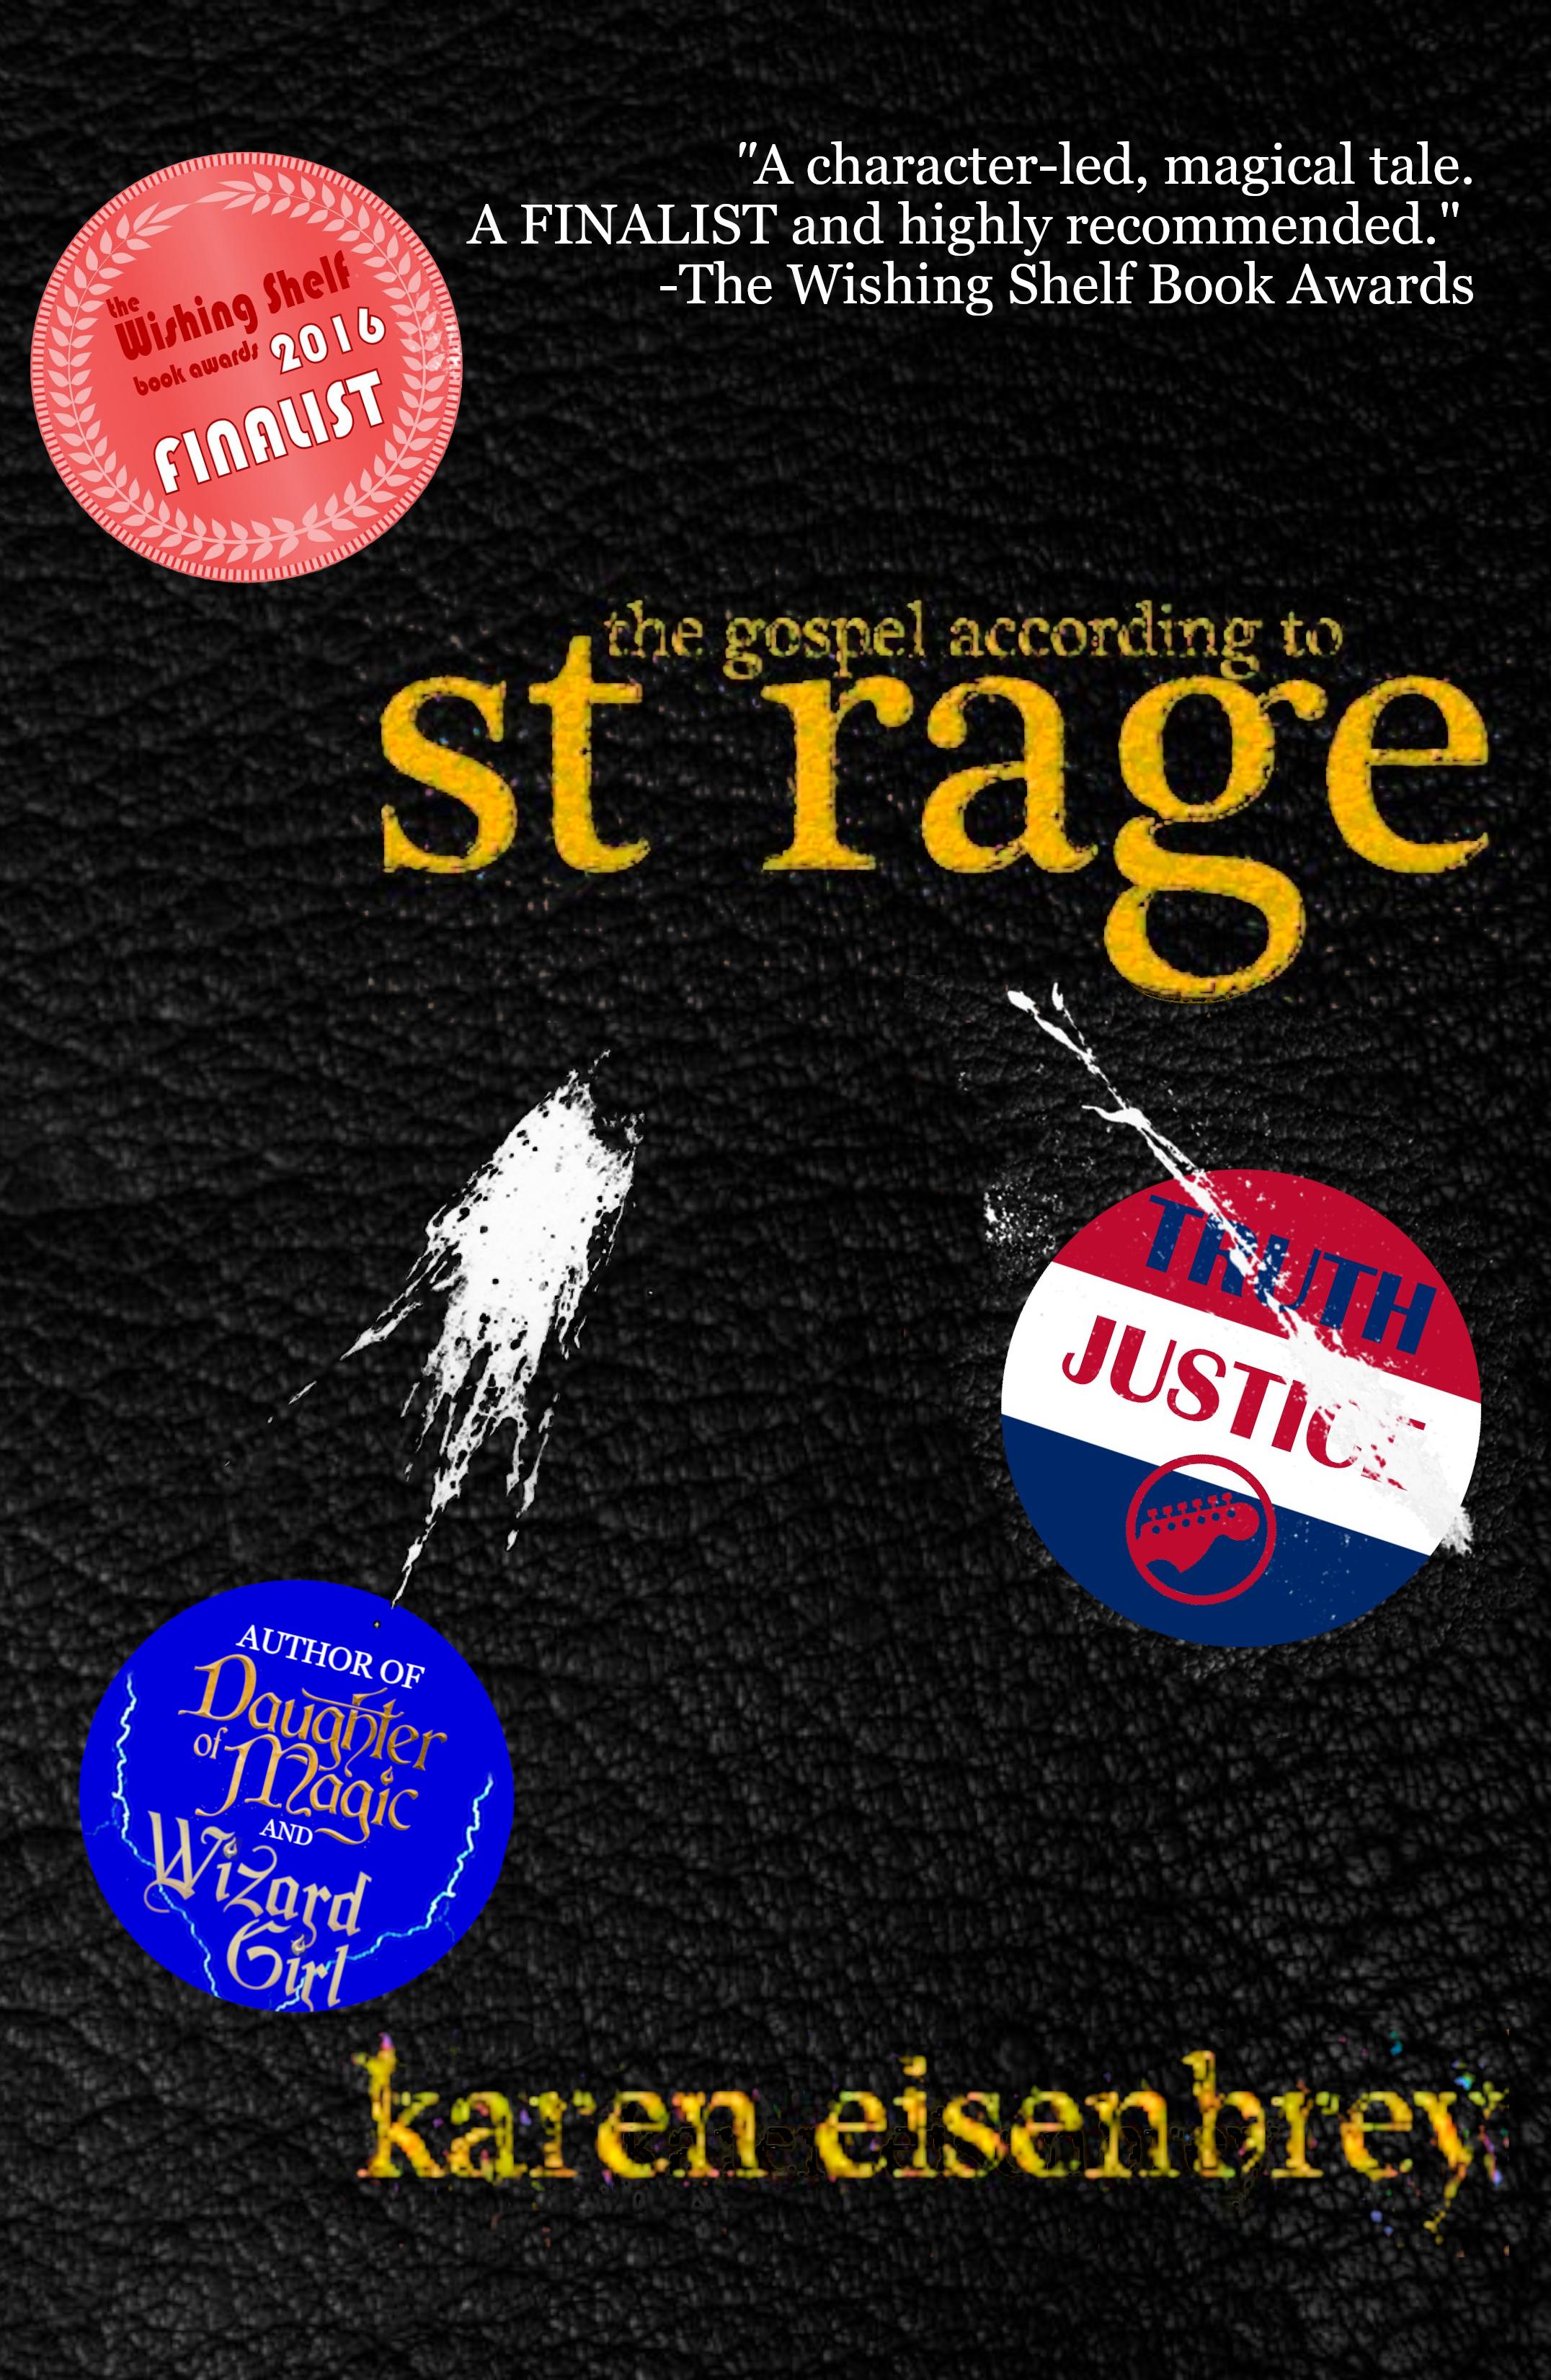 Cover designed by Evangeline Jennings and Benjamin Gorman